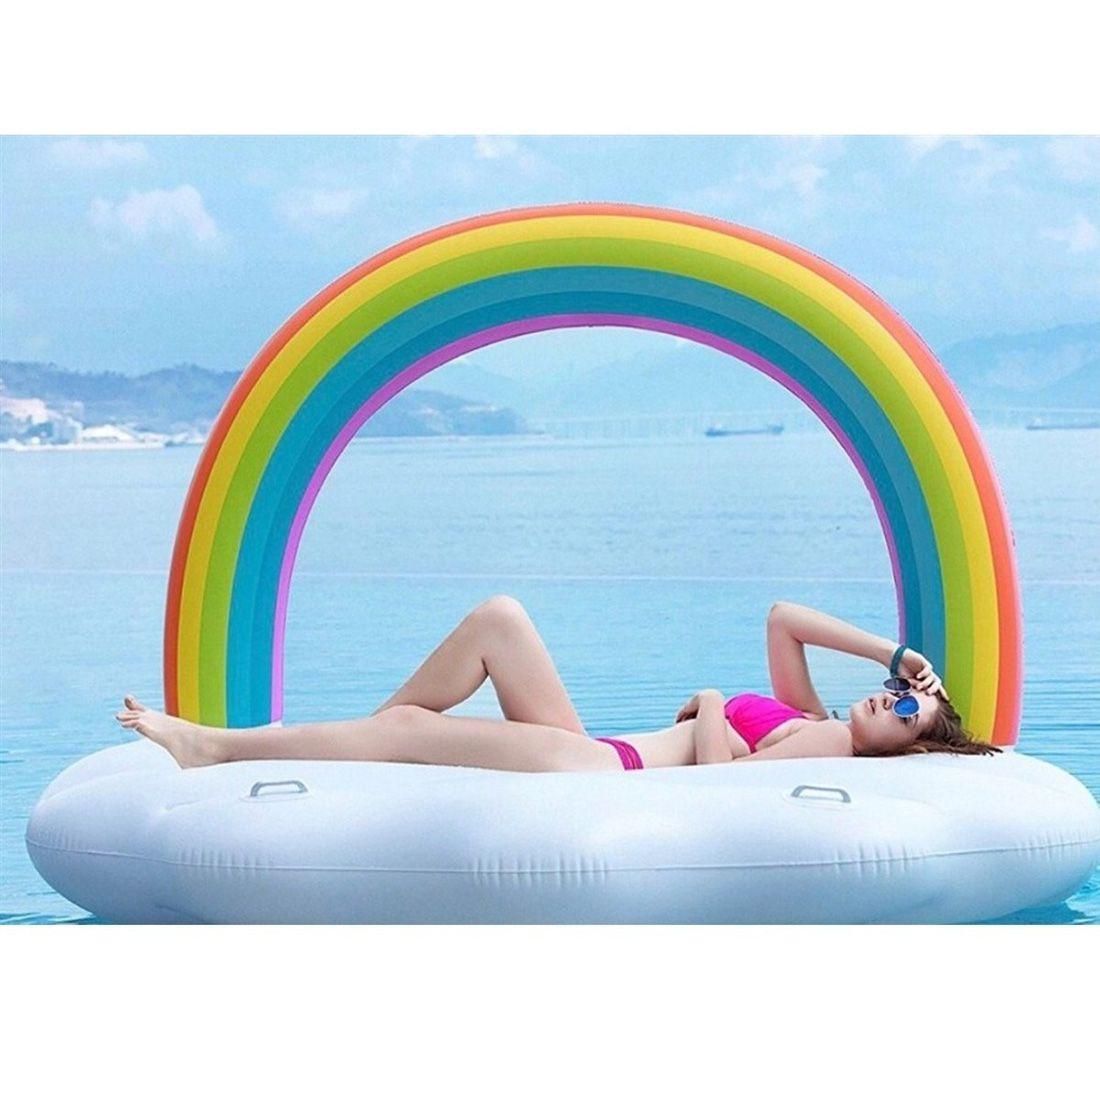 Boia Gigante Arco Iris 4 Pessoas Inflavel Praia Flutuante 2 Metros Festa Lazer Piscina